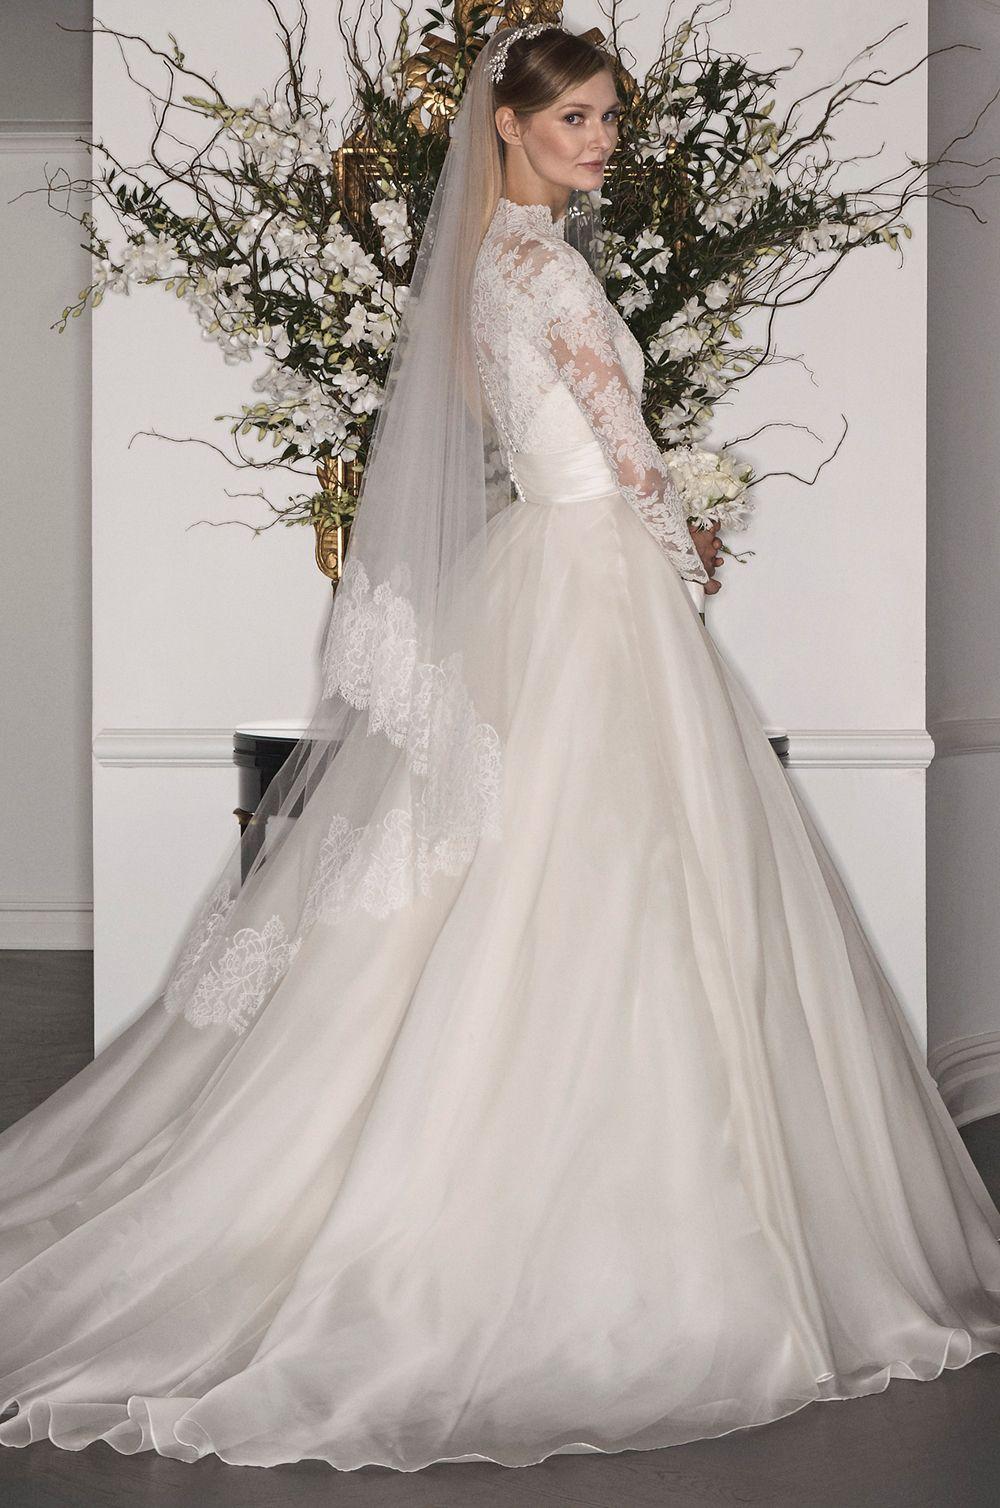 L7170-L7125BLOUSE | LEGENDS Romona Keveža Fall 2017 | Wedding Bells ...